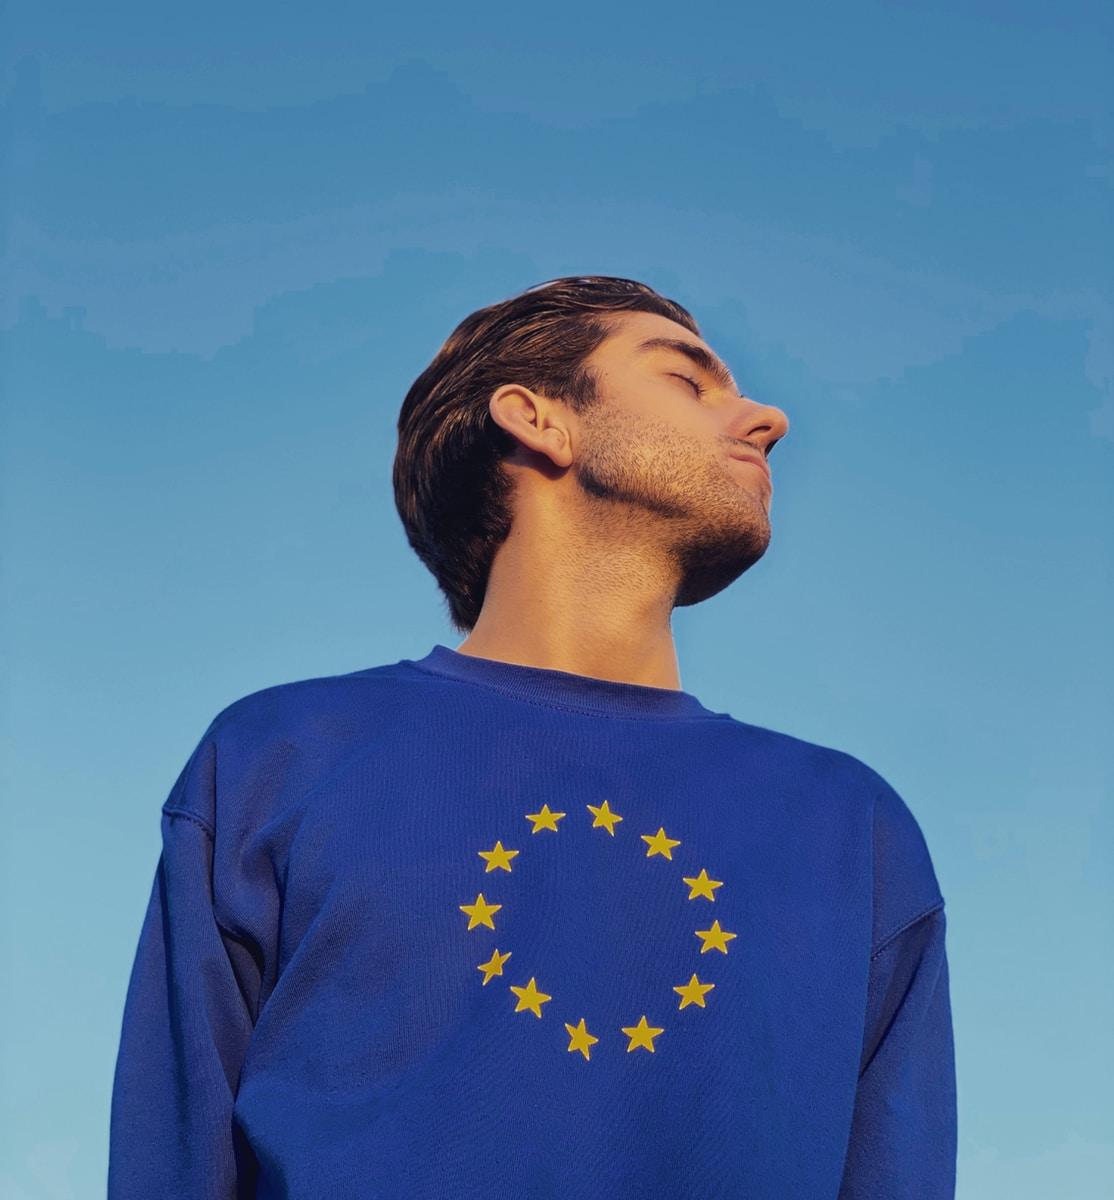 man in blue crew neck shirt under blue sky during daytime